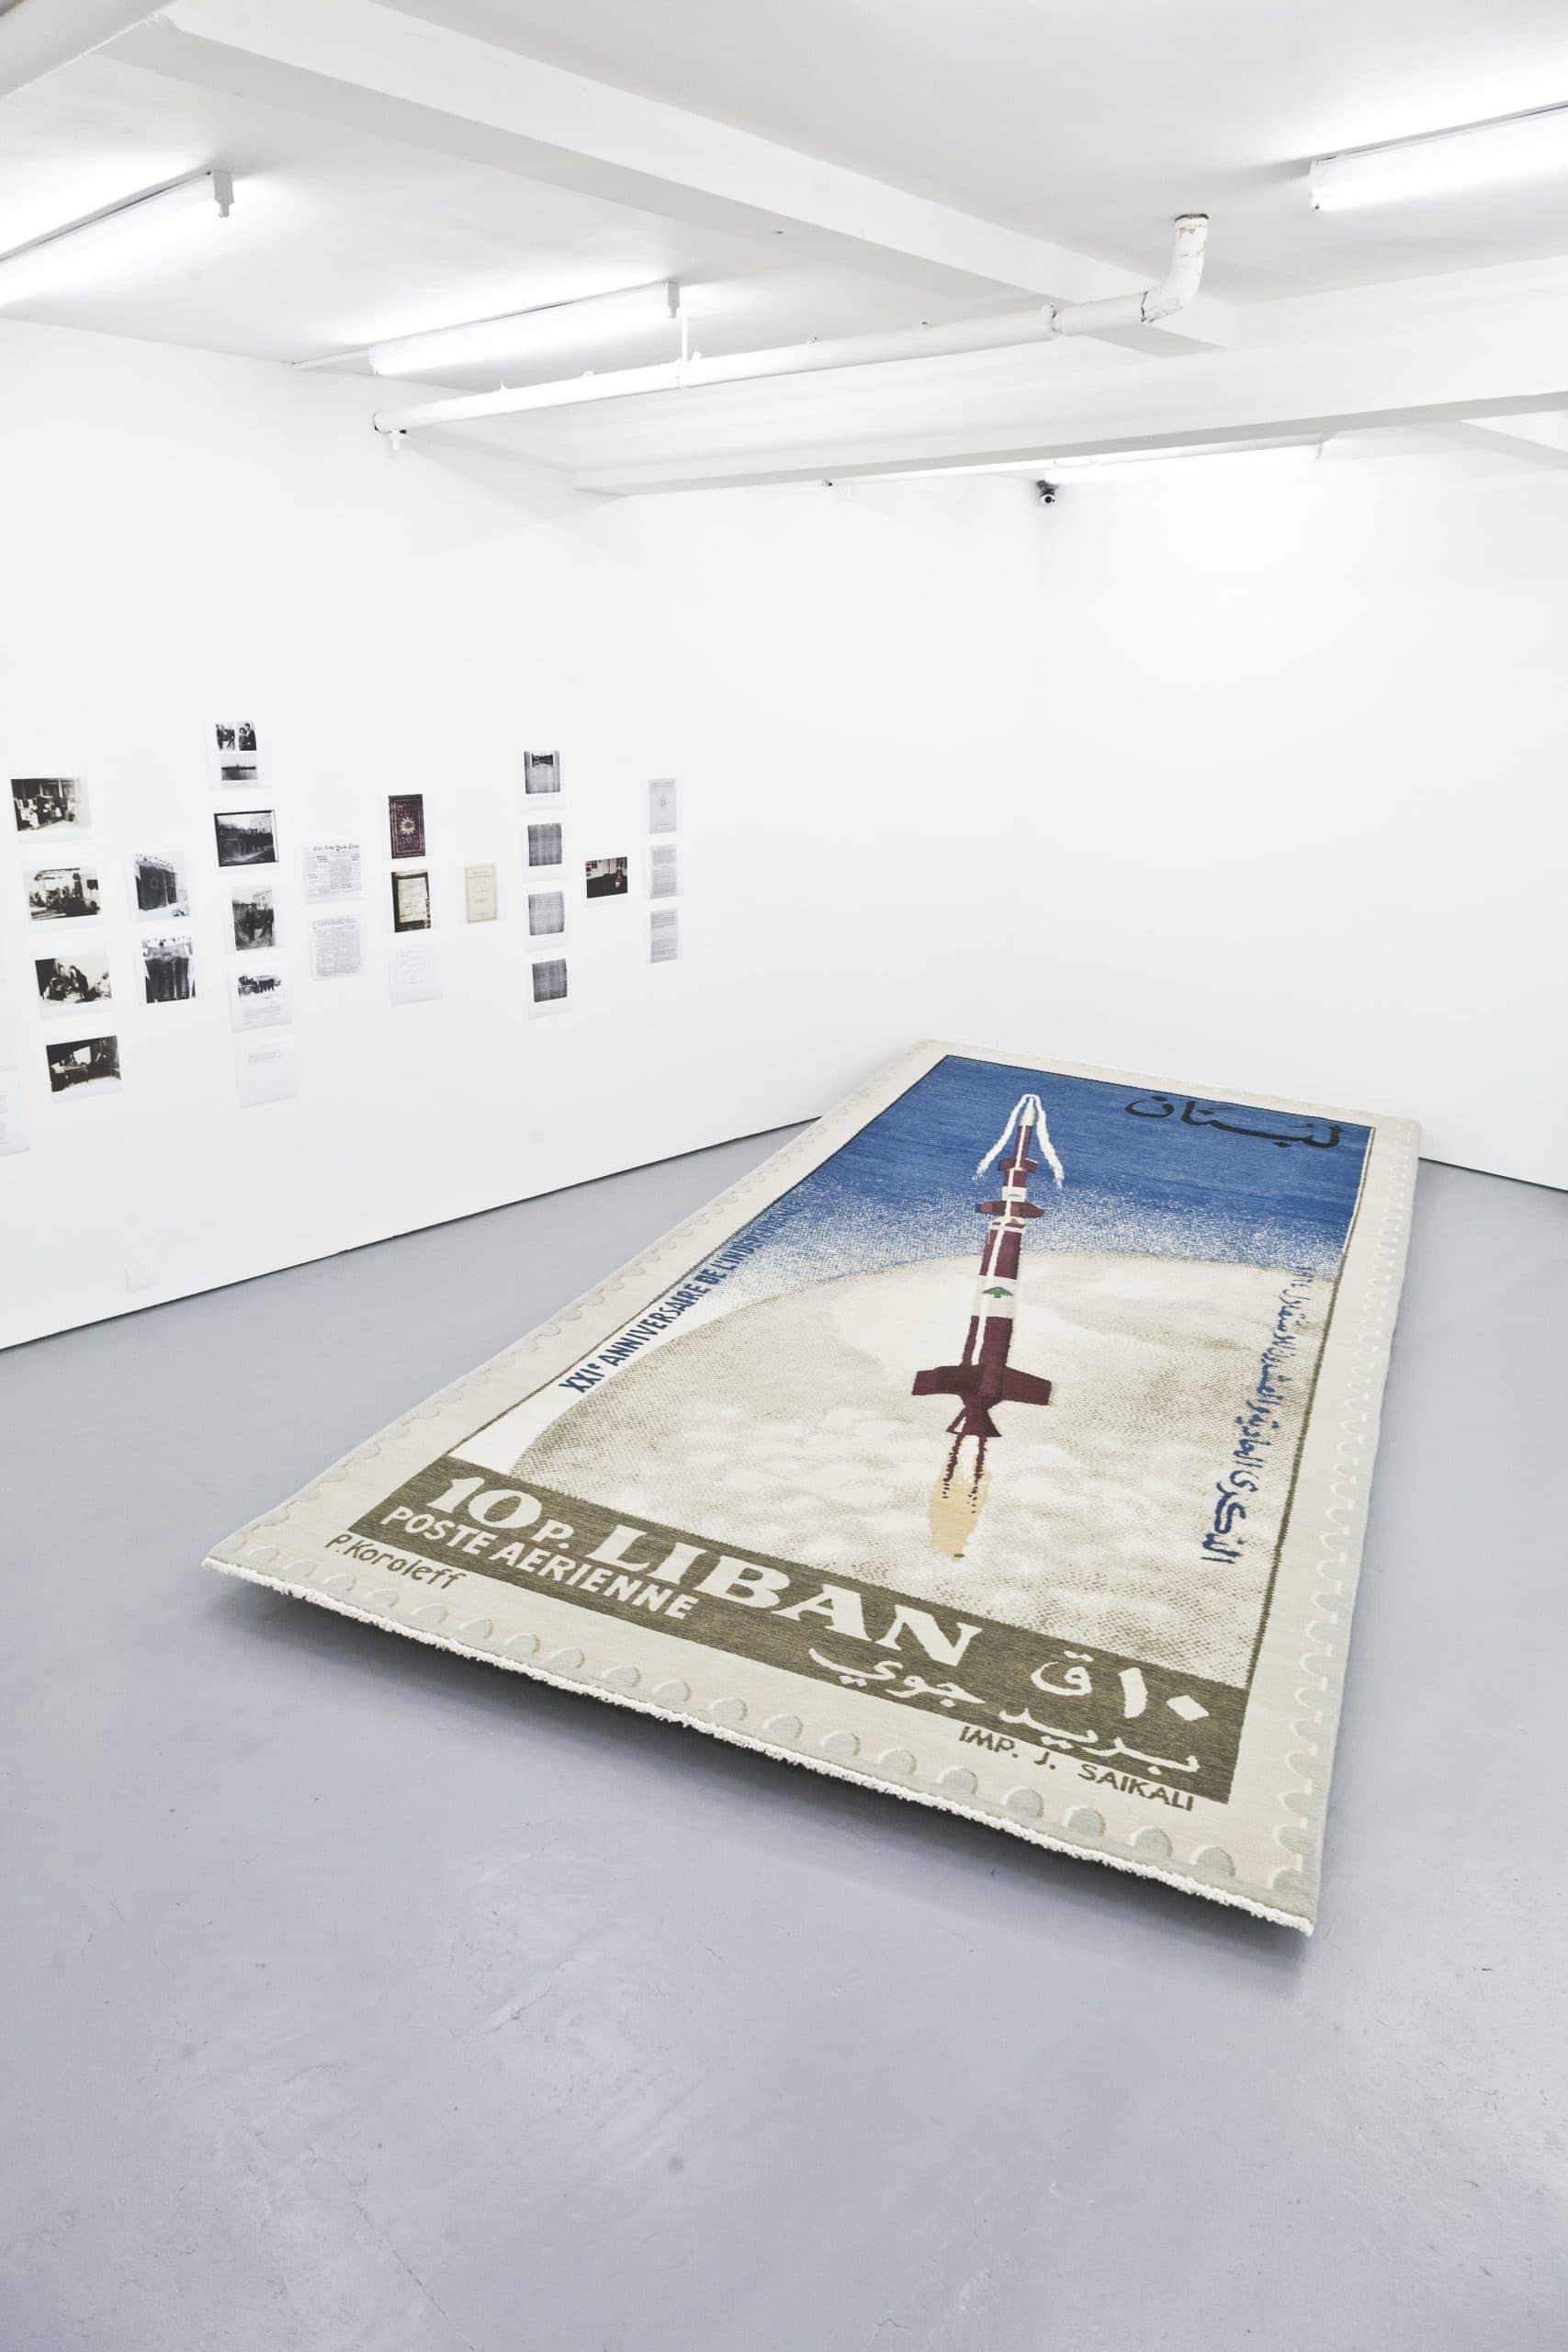 Joana Hadjithomas and Khalil Joreige, The Lebanese Rocket Society: A Carpet, 2012